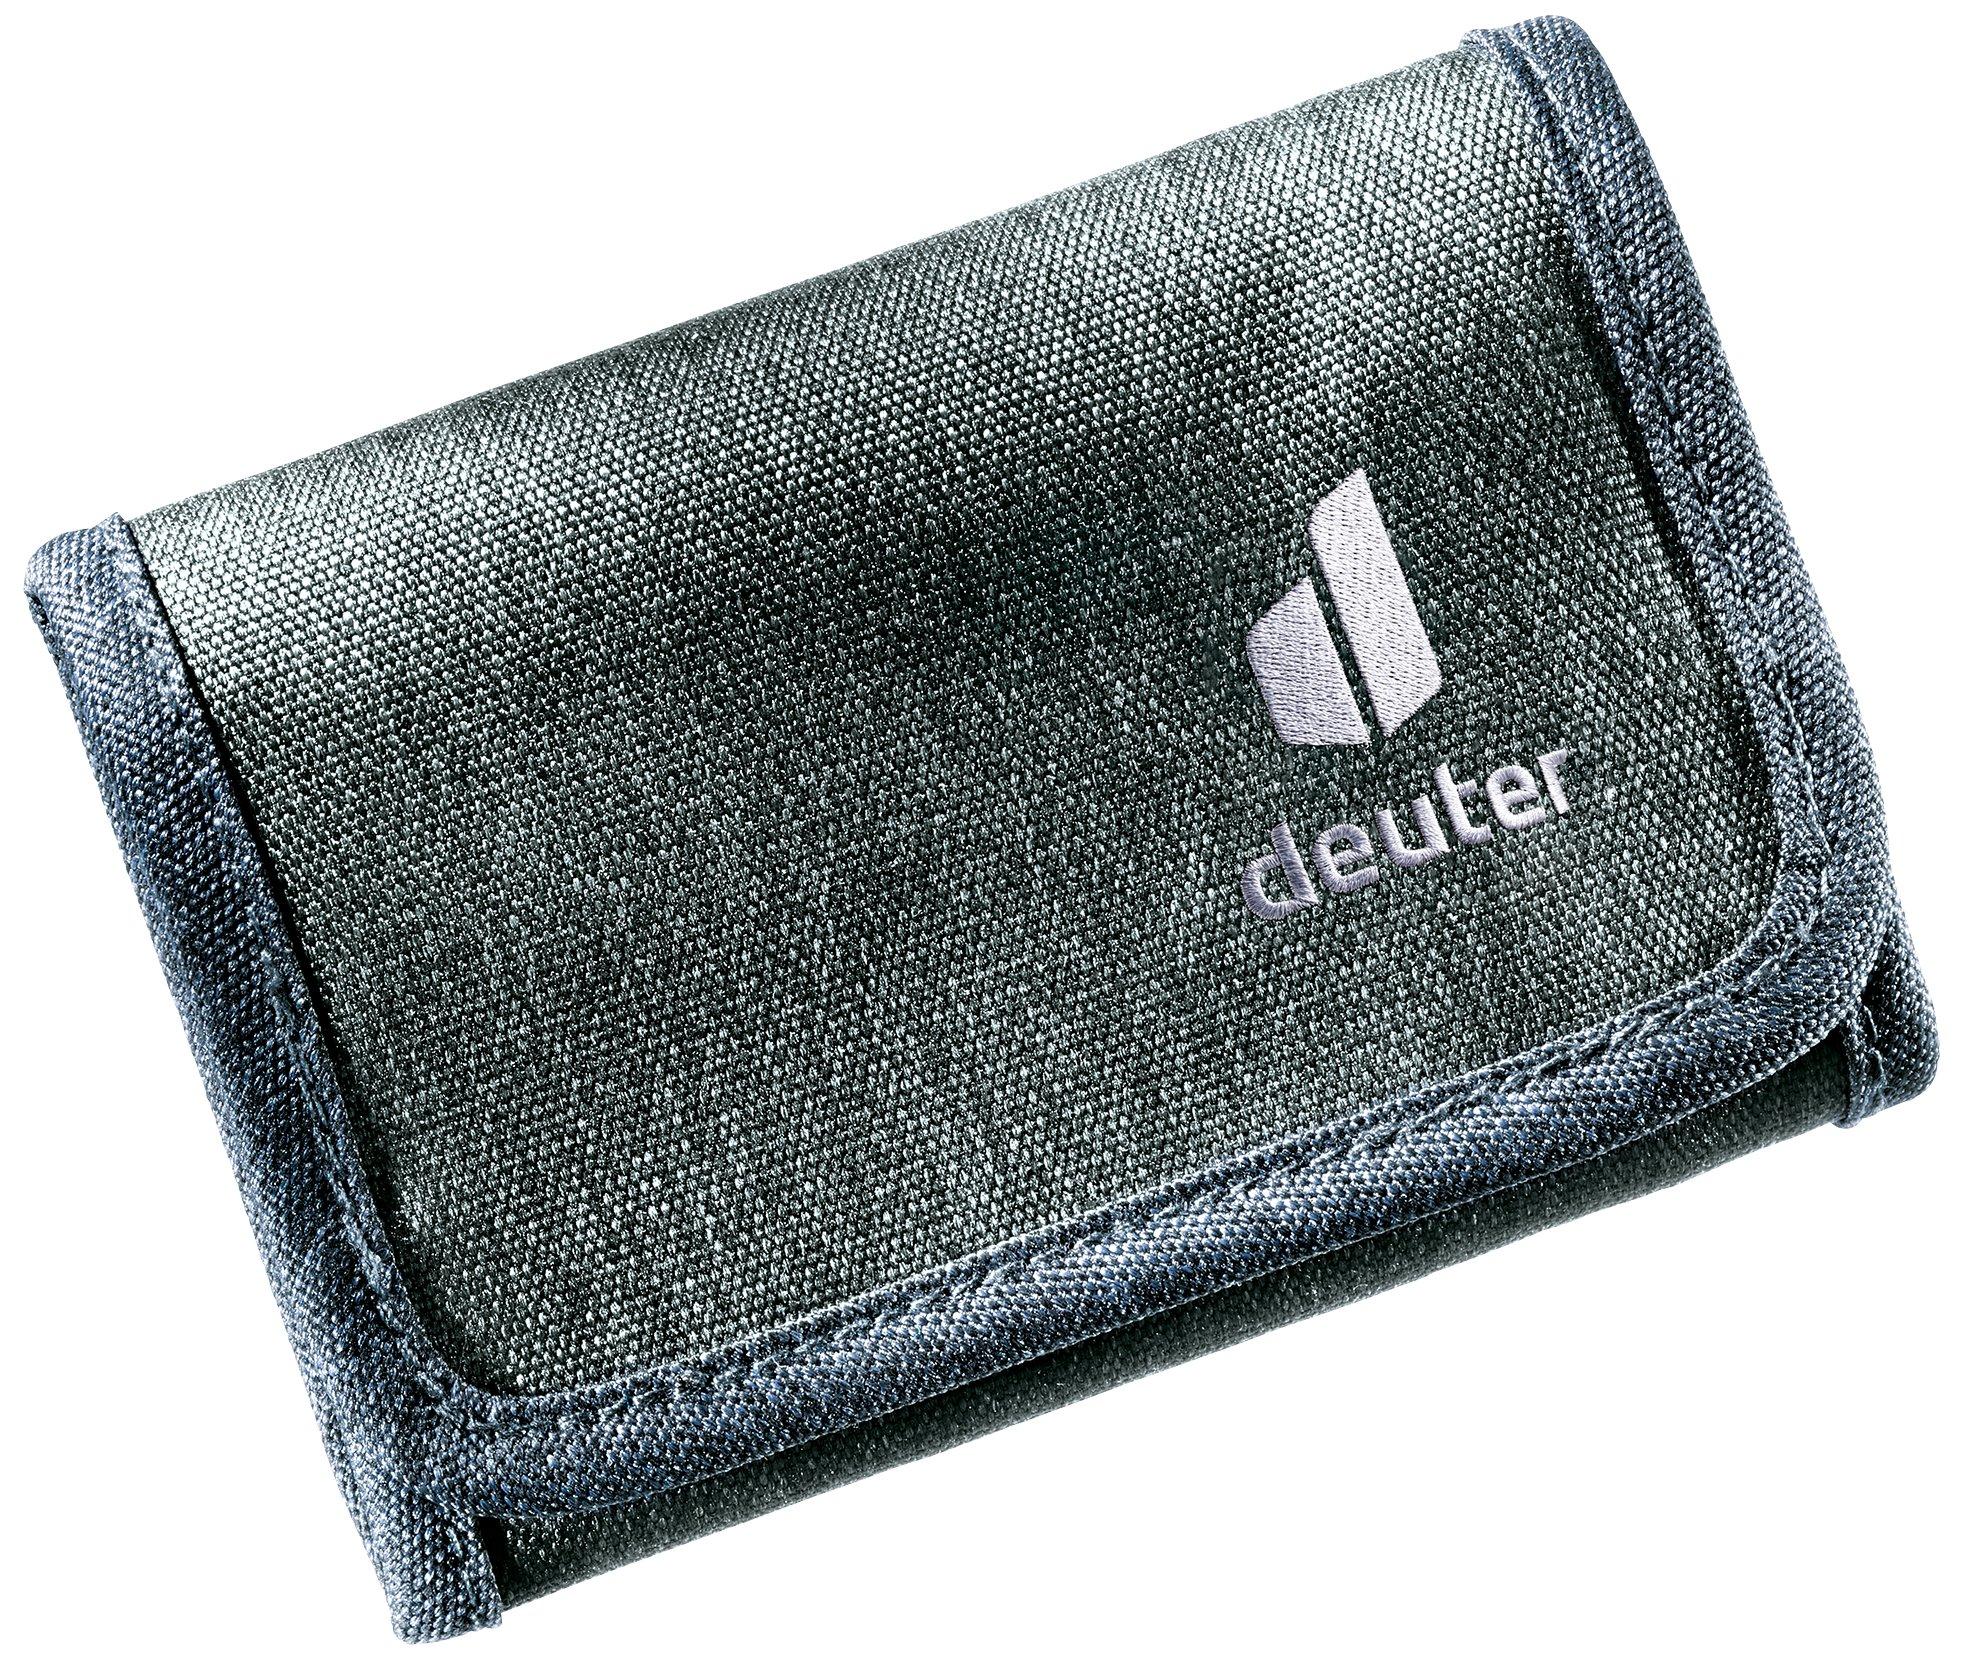 Deuter - Travel Wallet RFID BLOCK, Reiseaccessoire